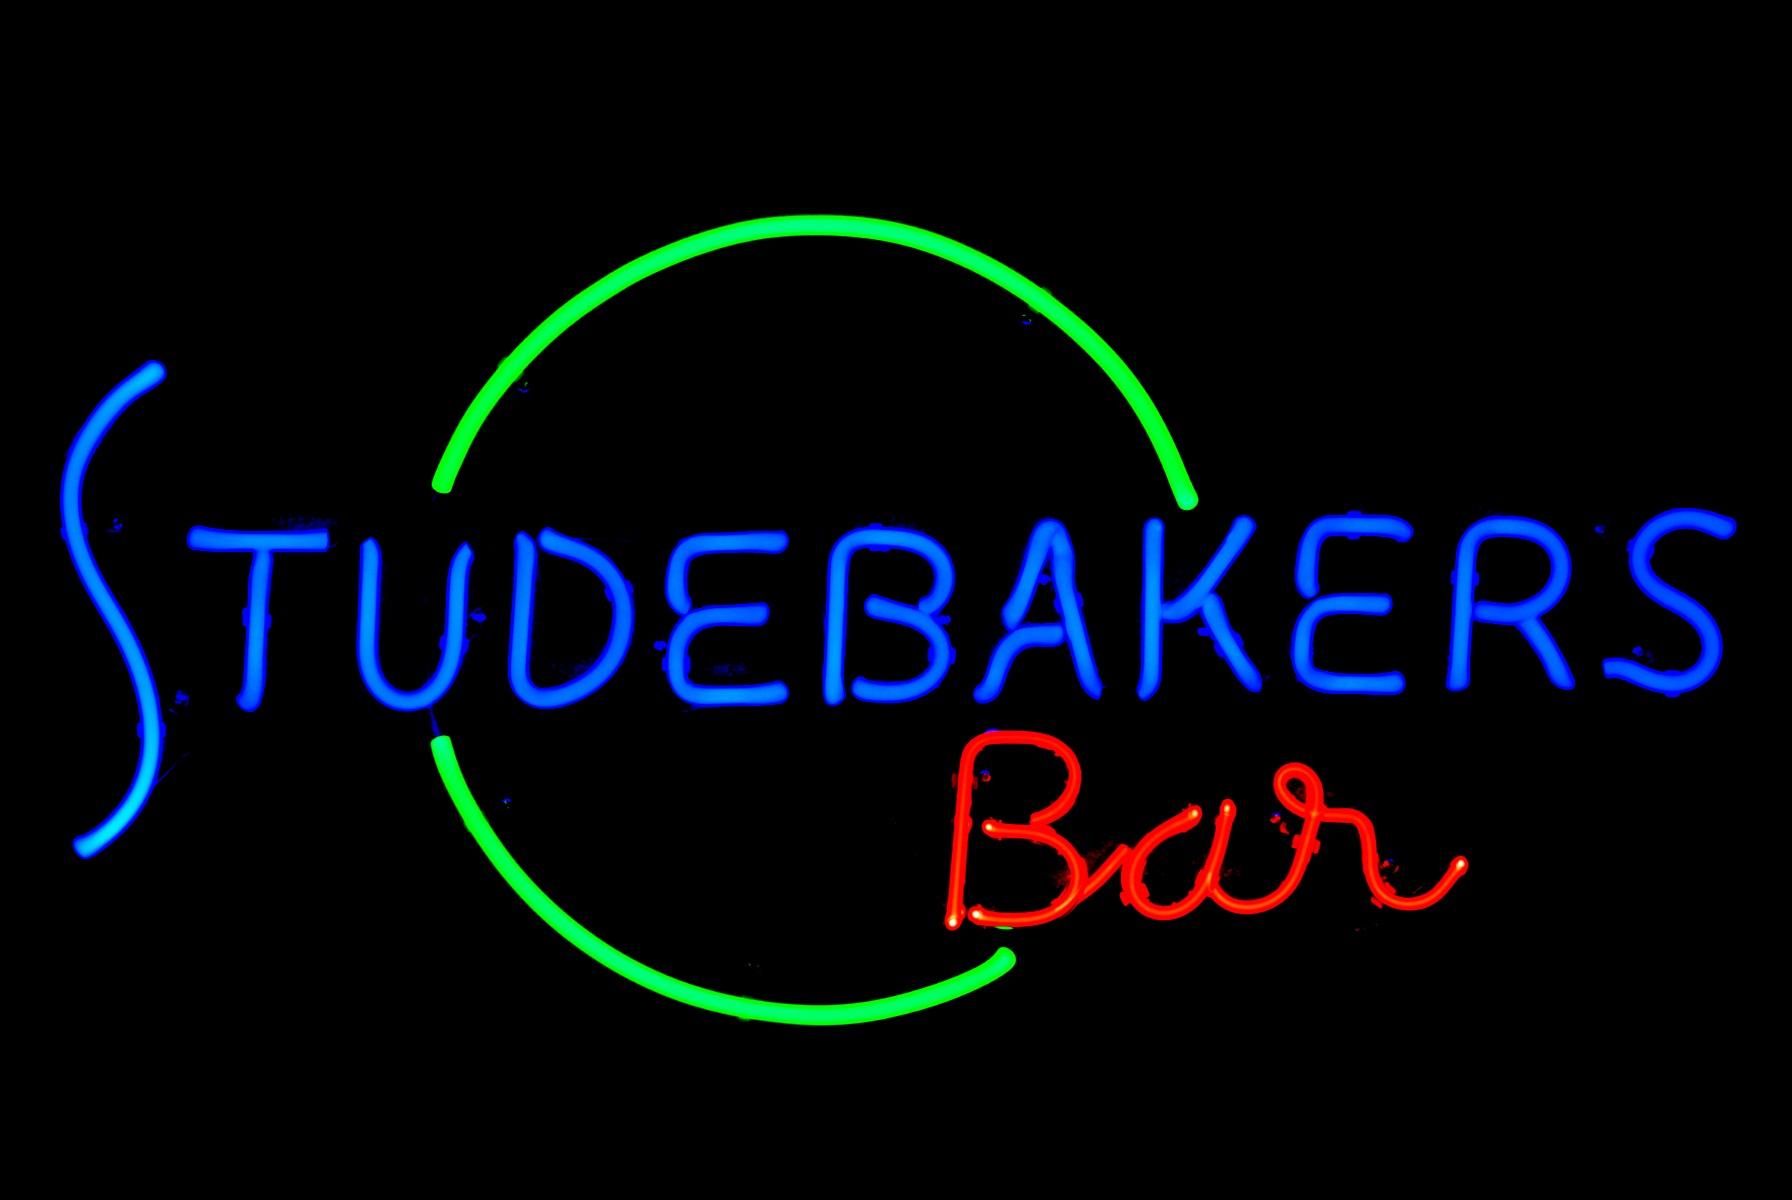 Studebakers Neon Sign.jpg